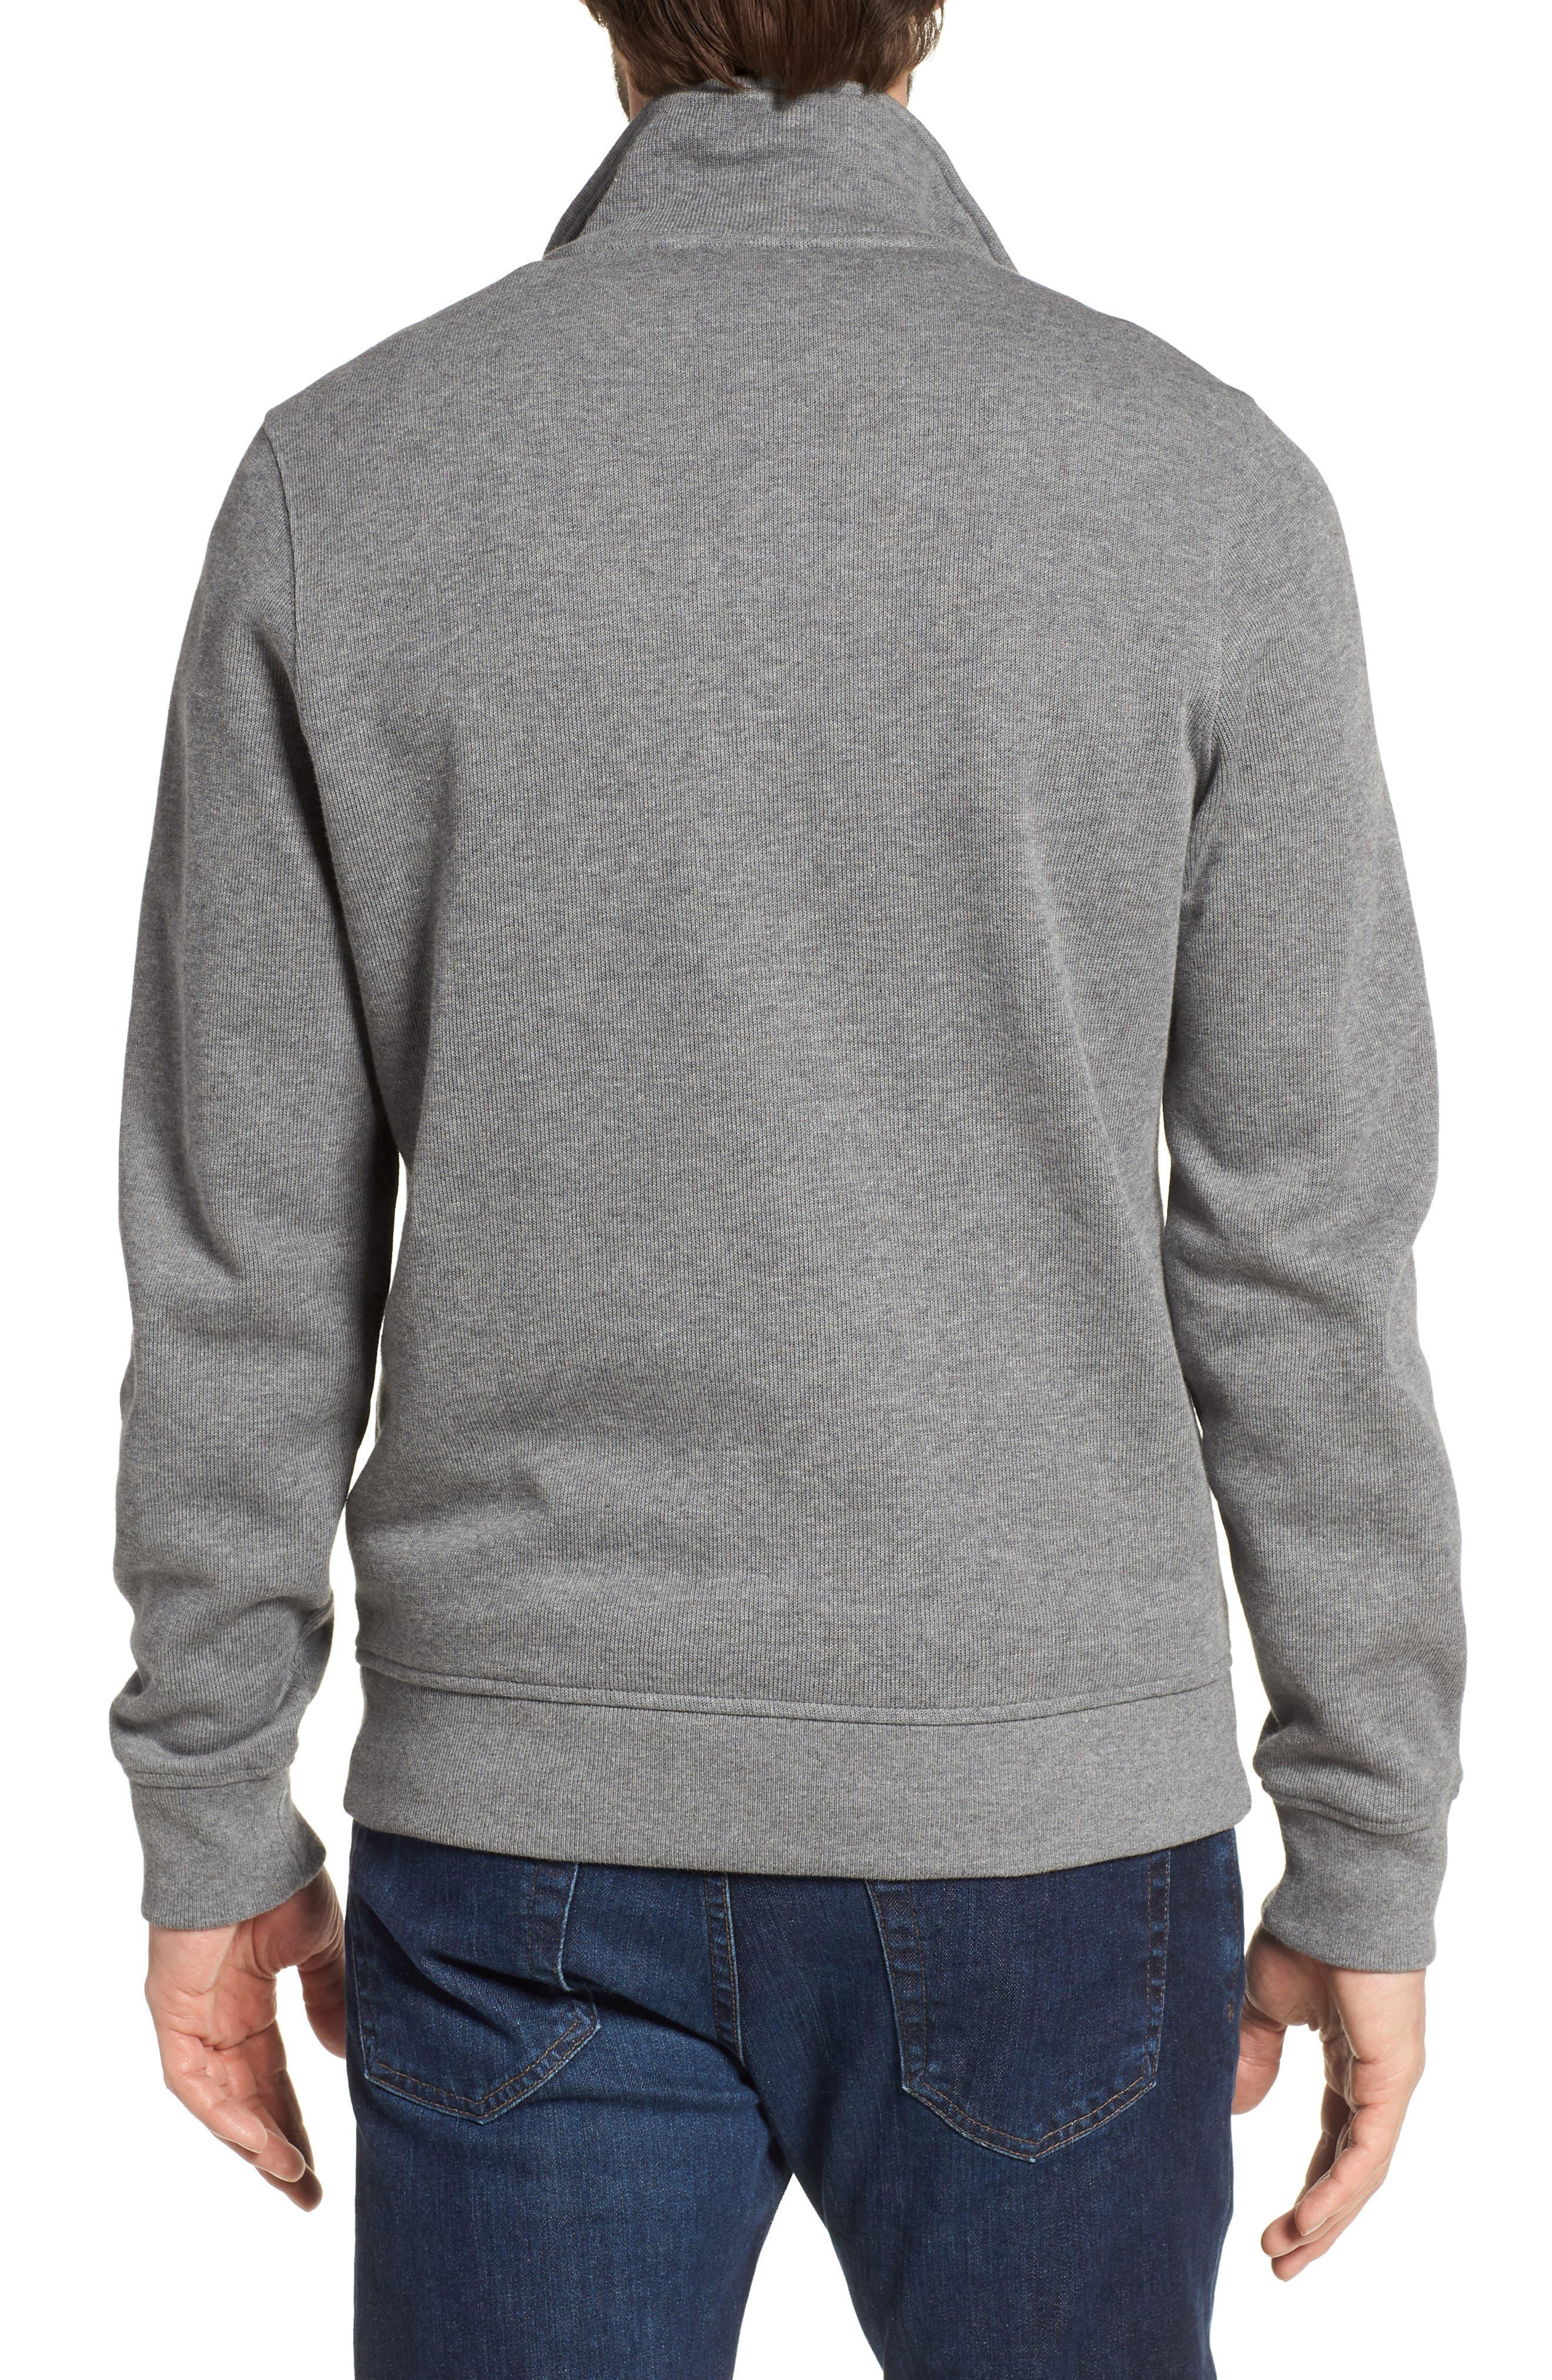 Quarter Zip Cotton Interlock Sweatshirt,                             Alternate thumbnail 2, color,                             GALAXITE CHINE/ NIMBUS